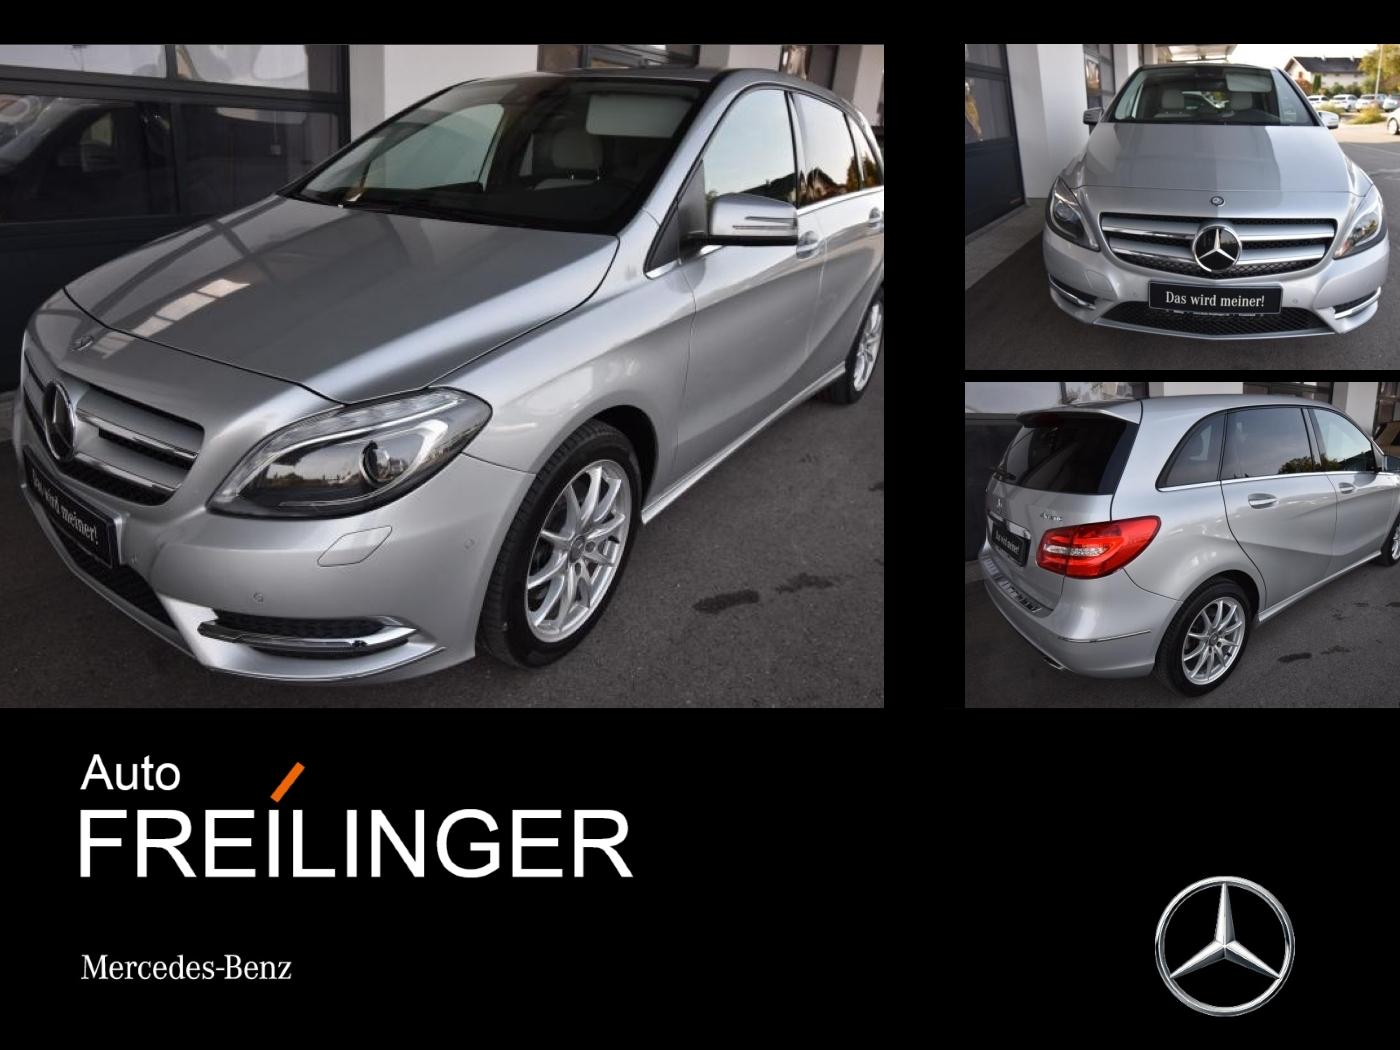 Mercedes-Benz B 220 4MATIC Comand Standheizung Xenon Fahrassis, Jahr 2014, Benzin